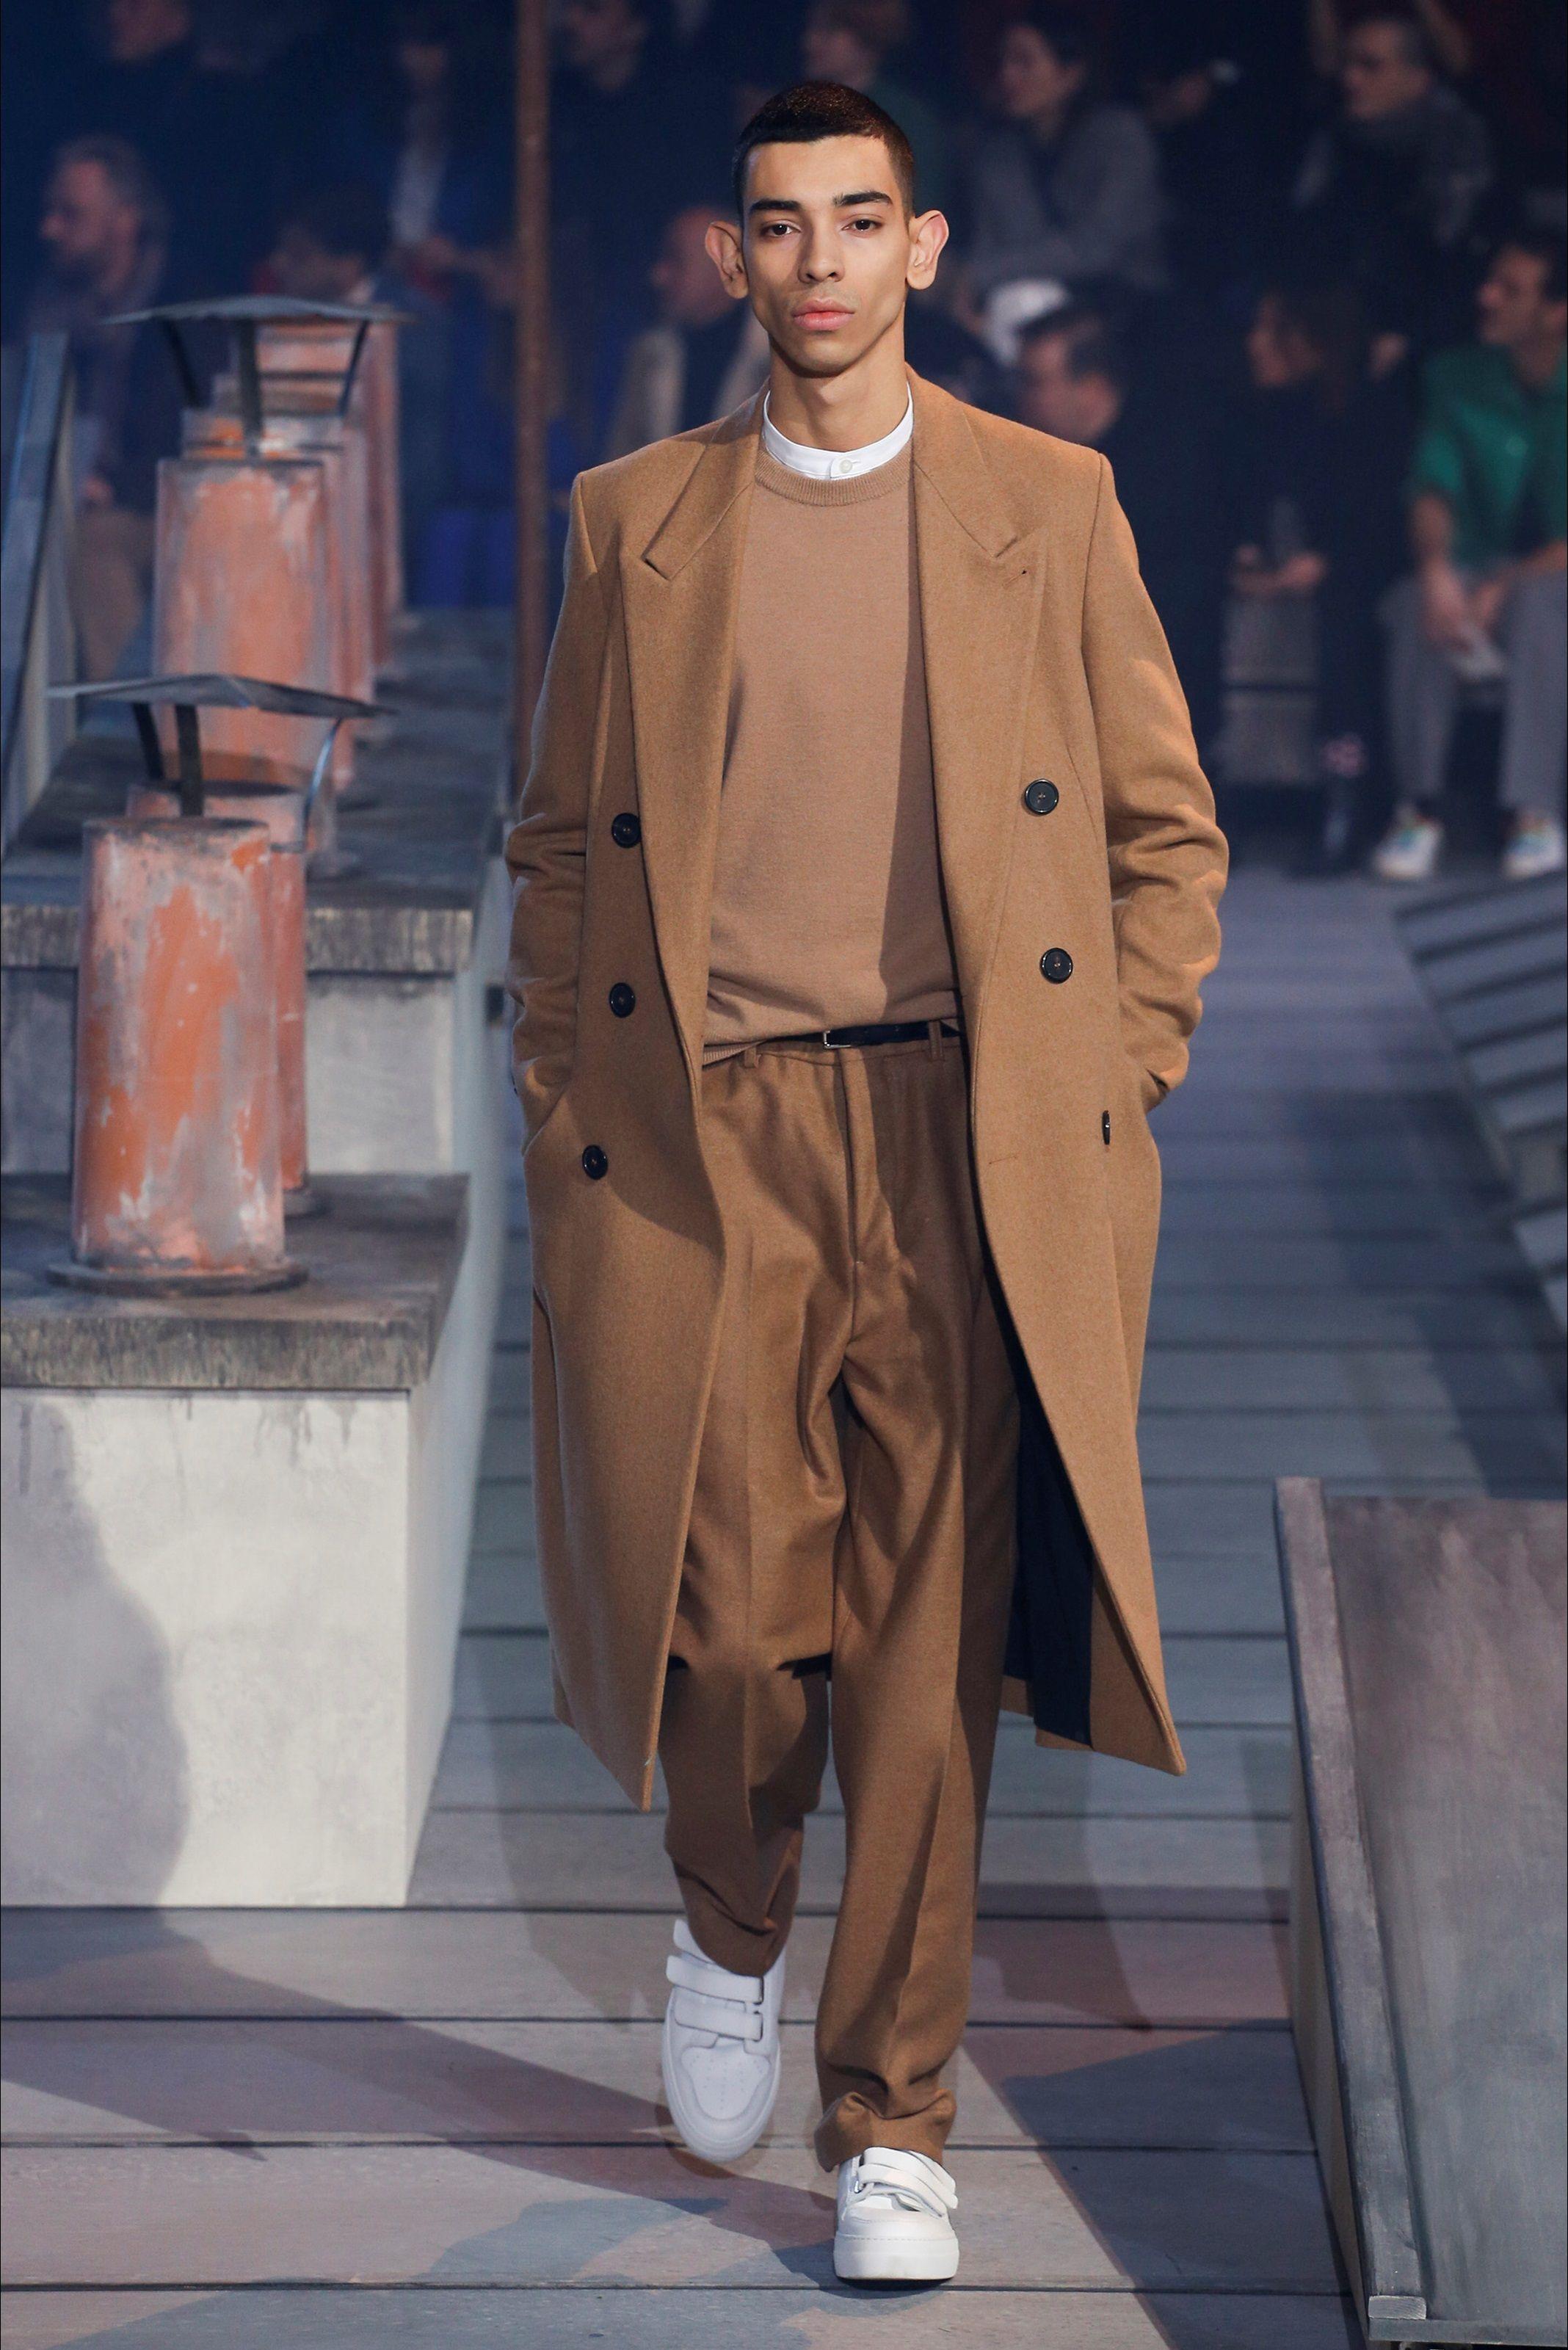 6f1536386 Sfilata Moda Uomo Ami Parigi - Autunno Inverno 2018-19 - Vogue ...